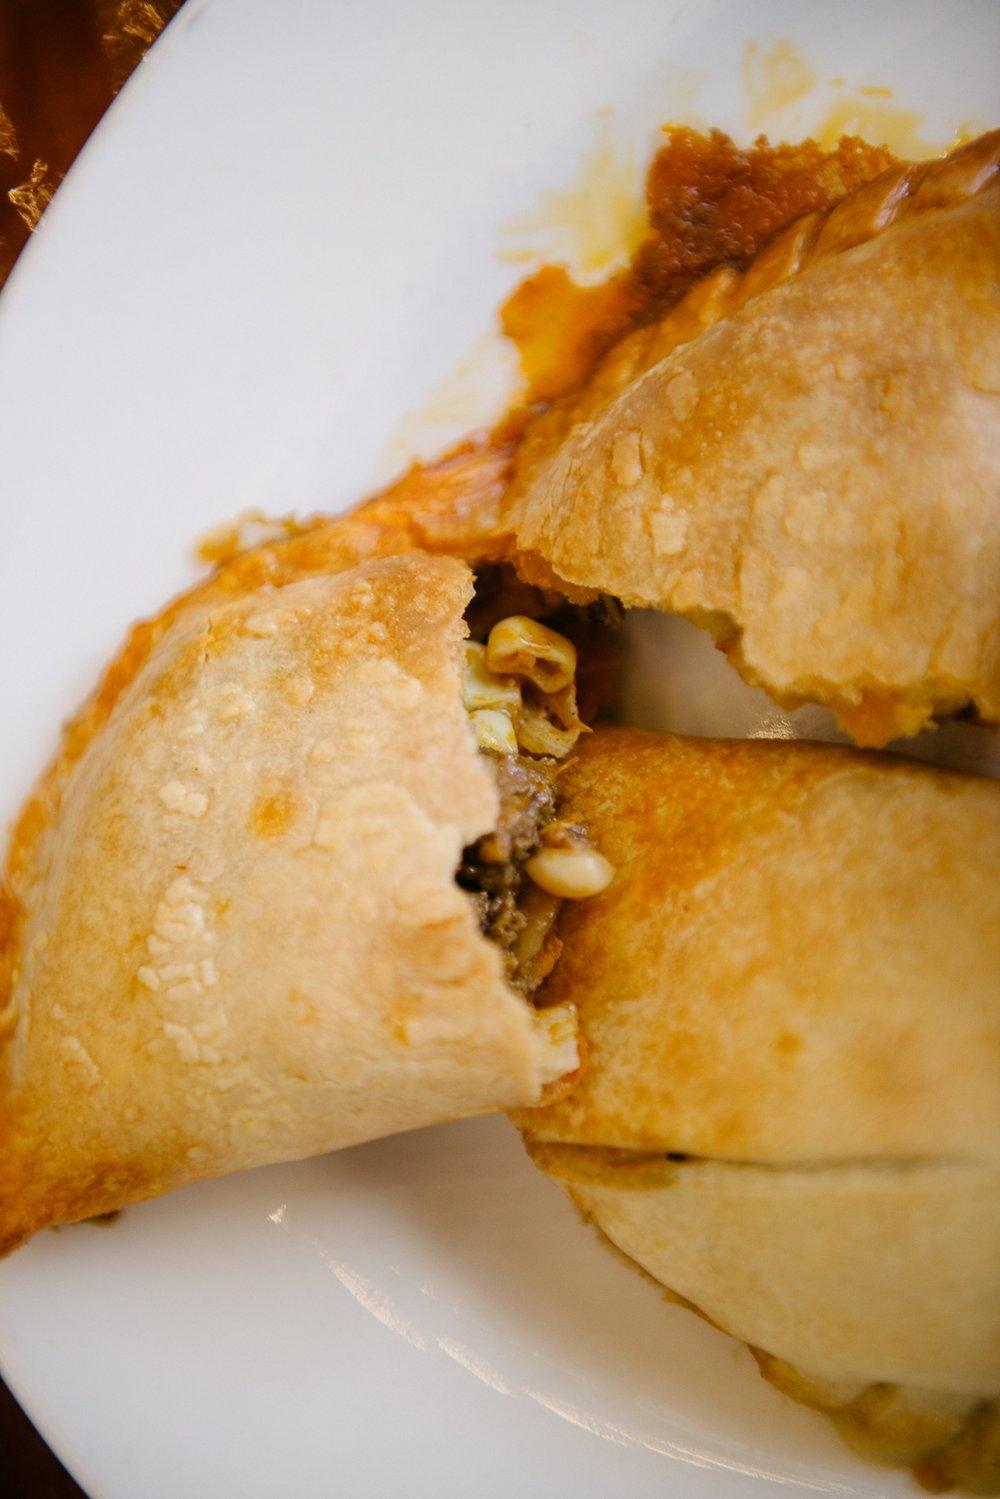 Luna empanadas stuffed with pork carnita, collards, hominy, and corn